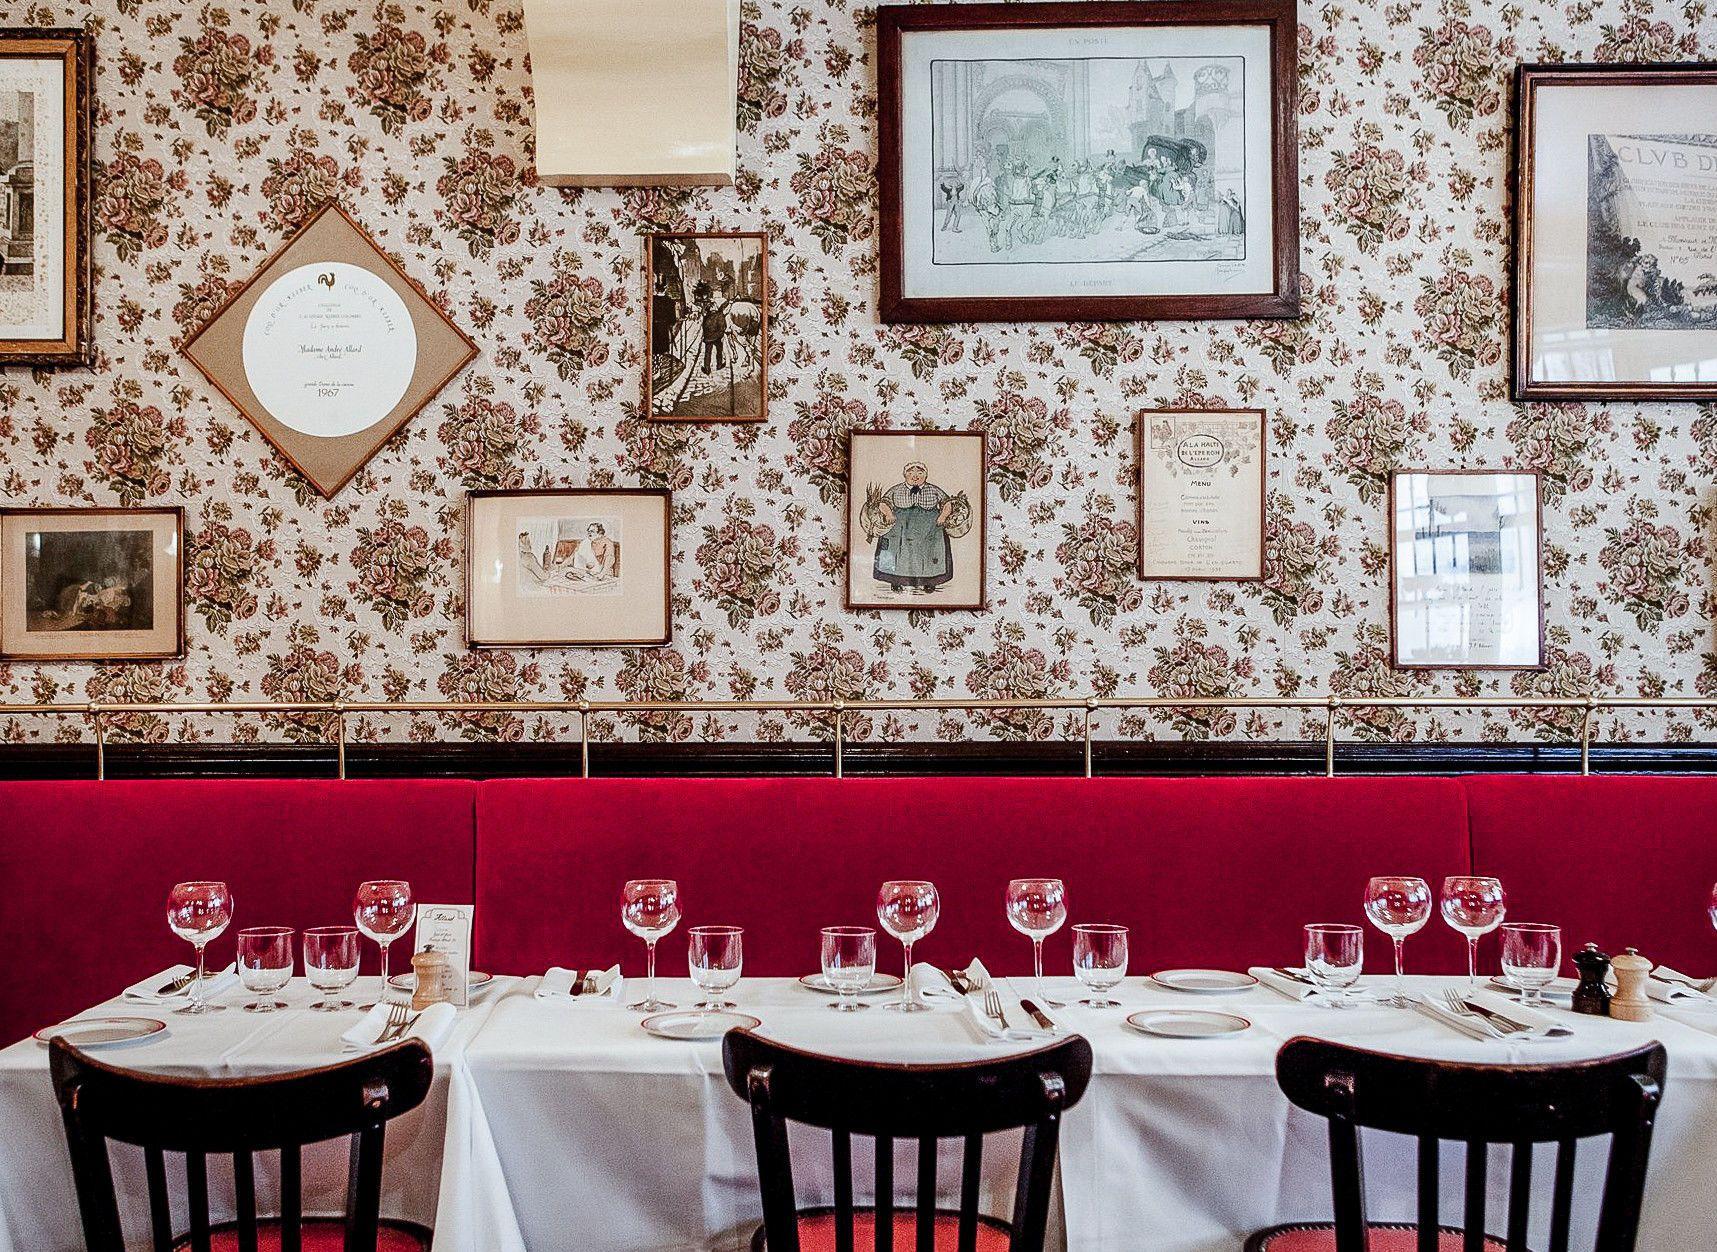 10 Best Restaurants In Paris Paris Restaurants Best Restaurants In Paris Romantic Restaurant